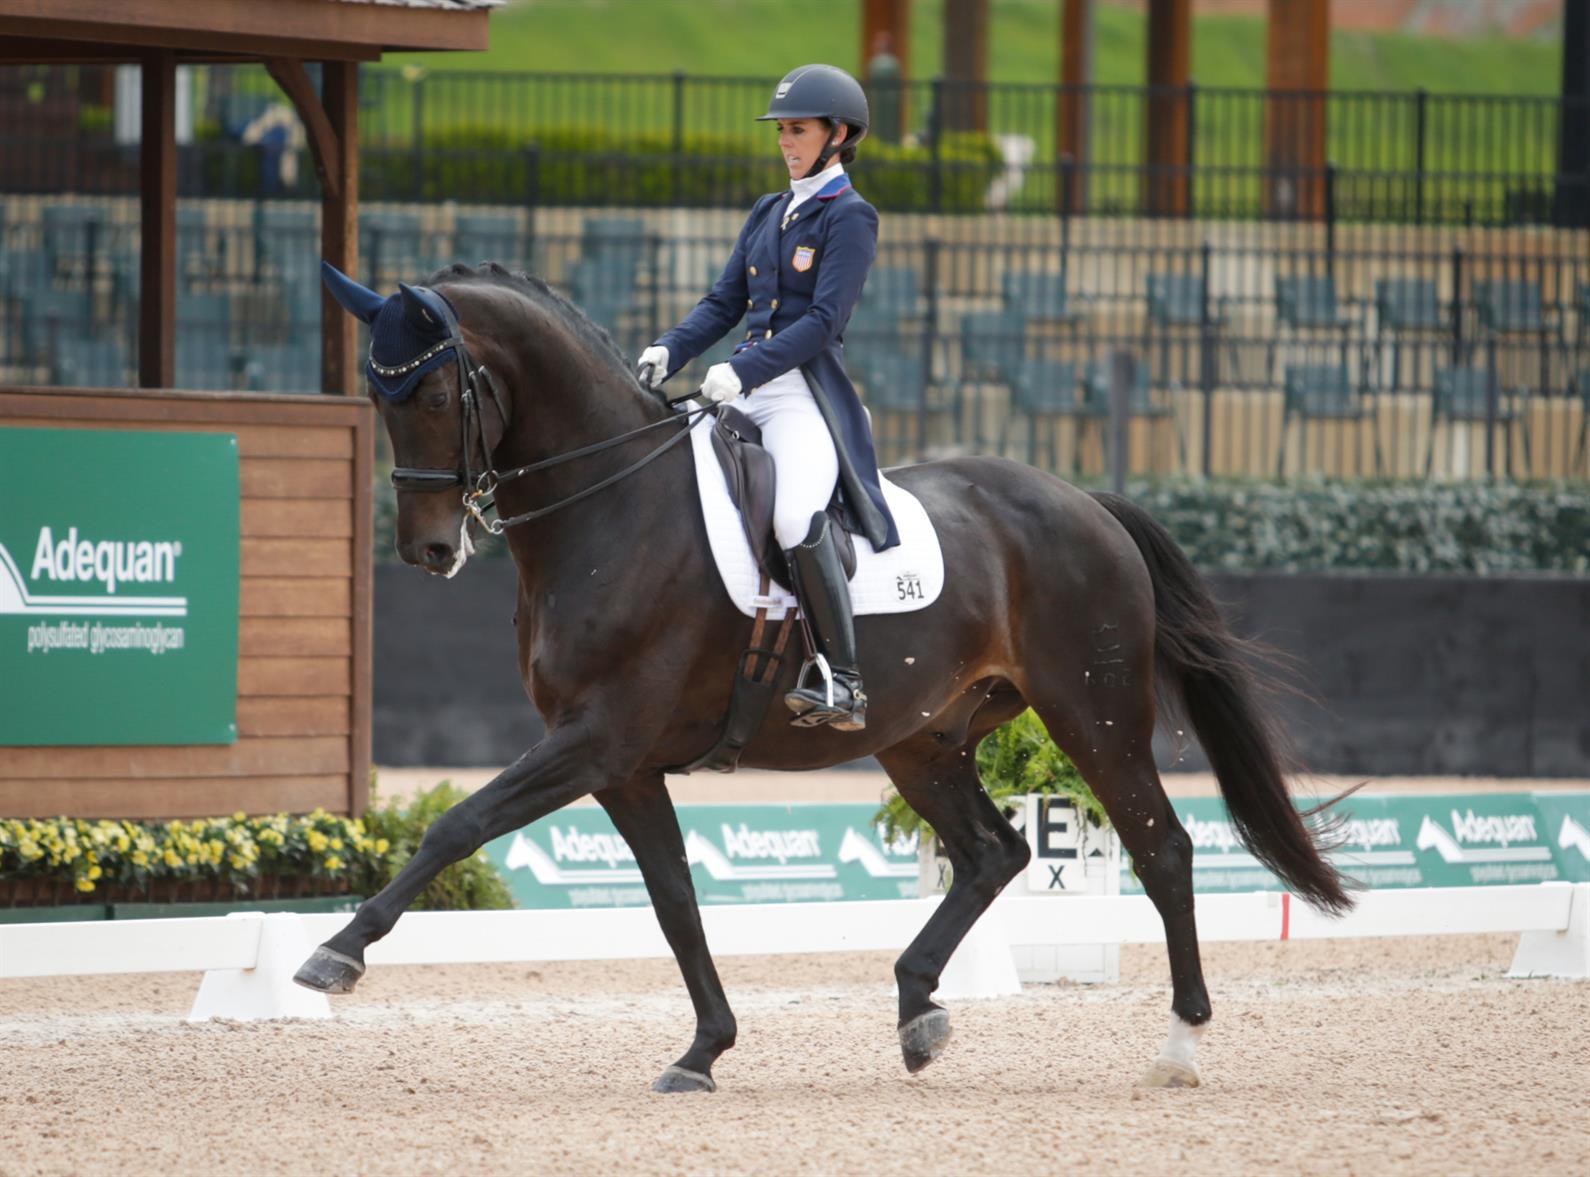 U S Dressage Looks Toward The Fei World Equestrian Games